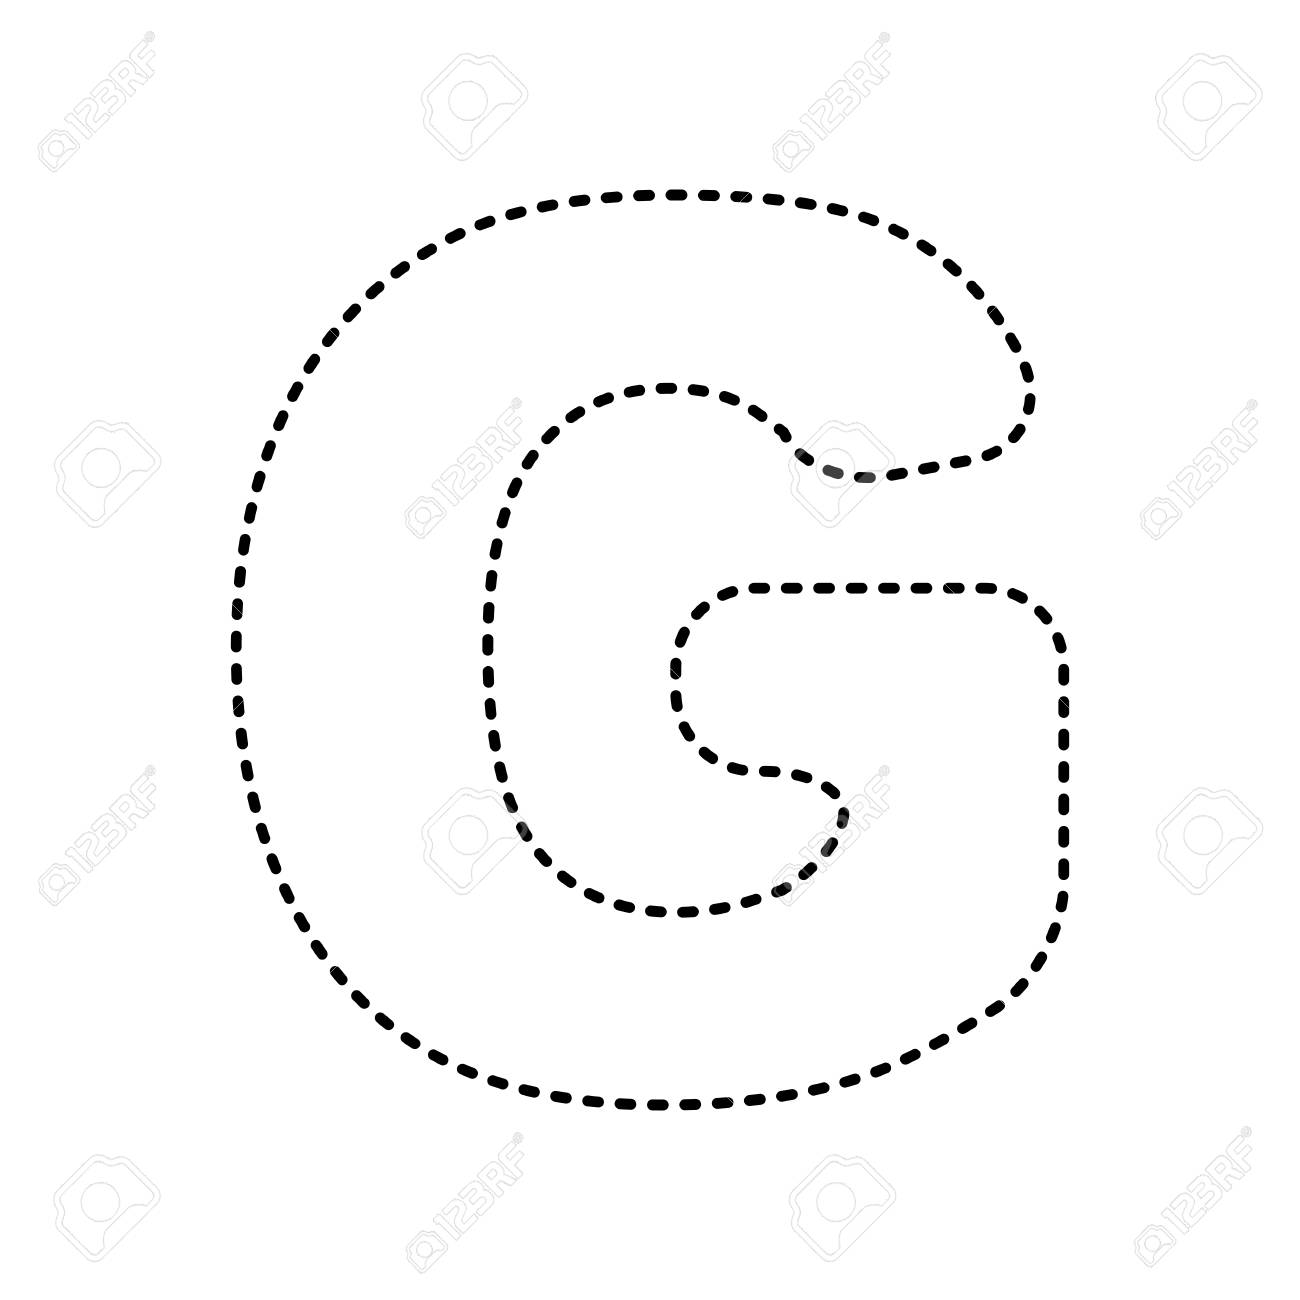 letter g sign design template element vector black dashed icon